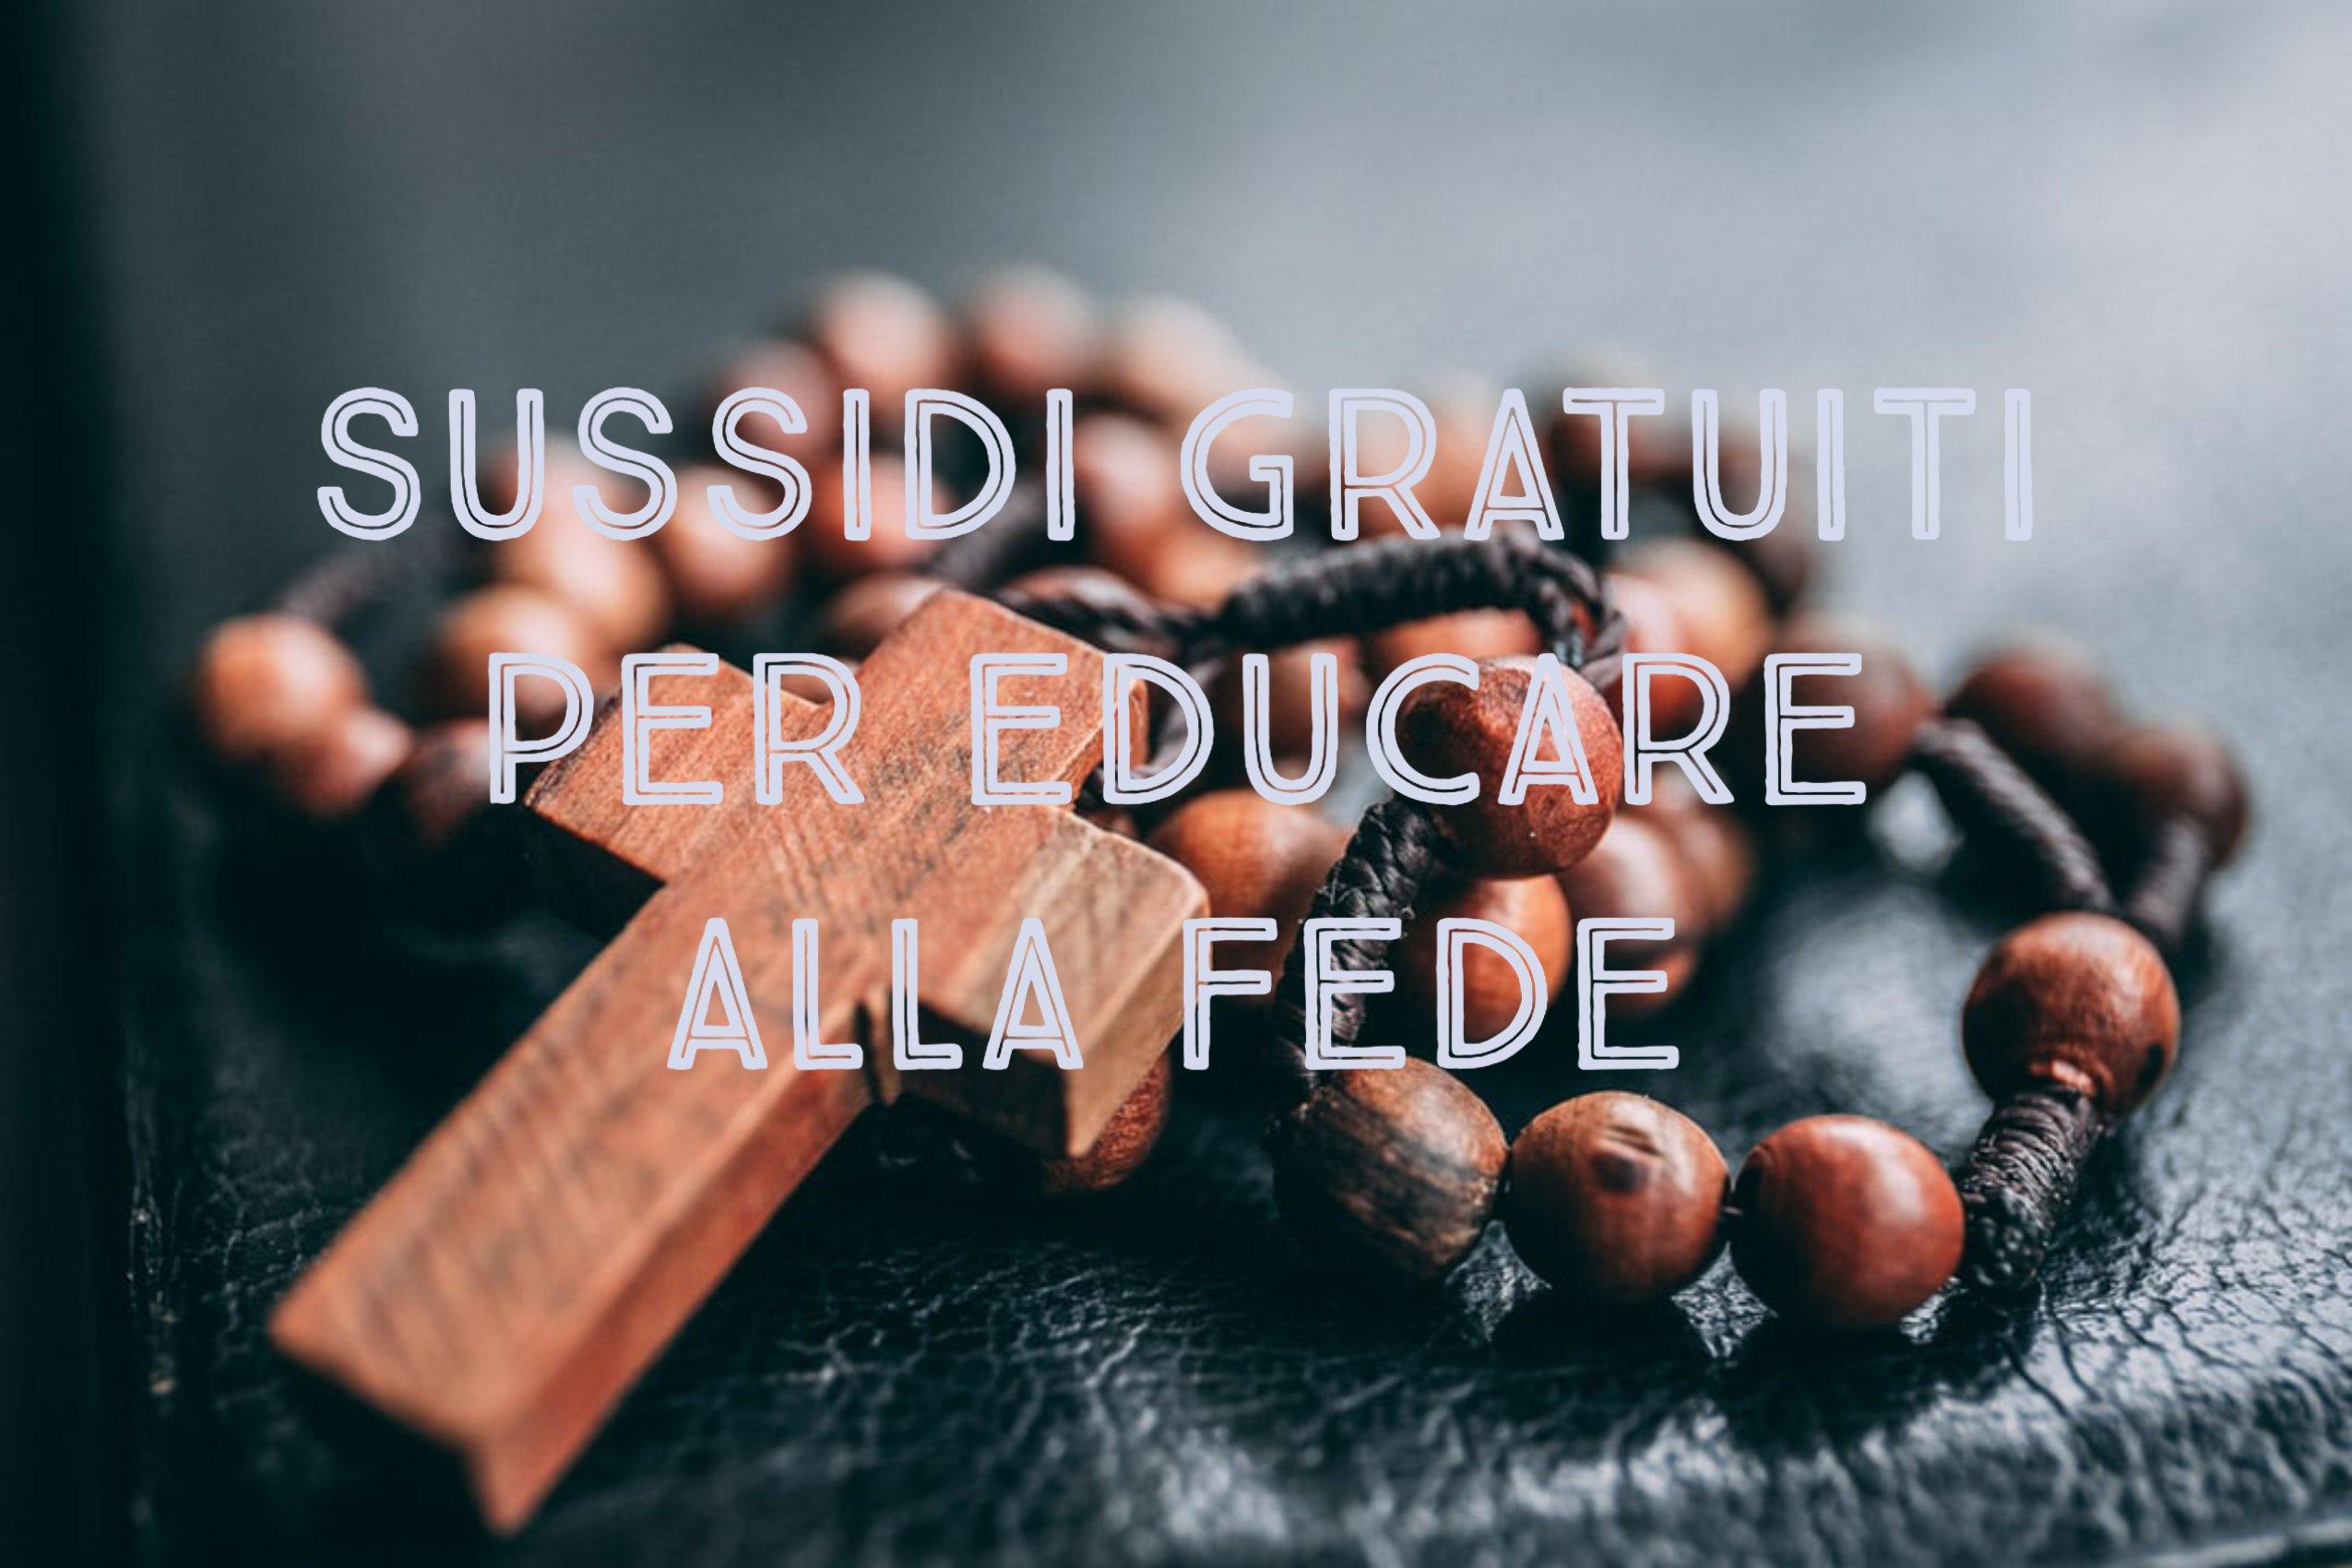 Sussidi gratis per educare alla fede